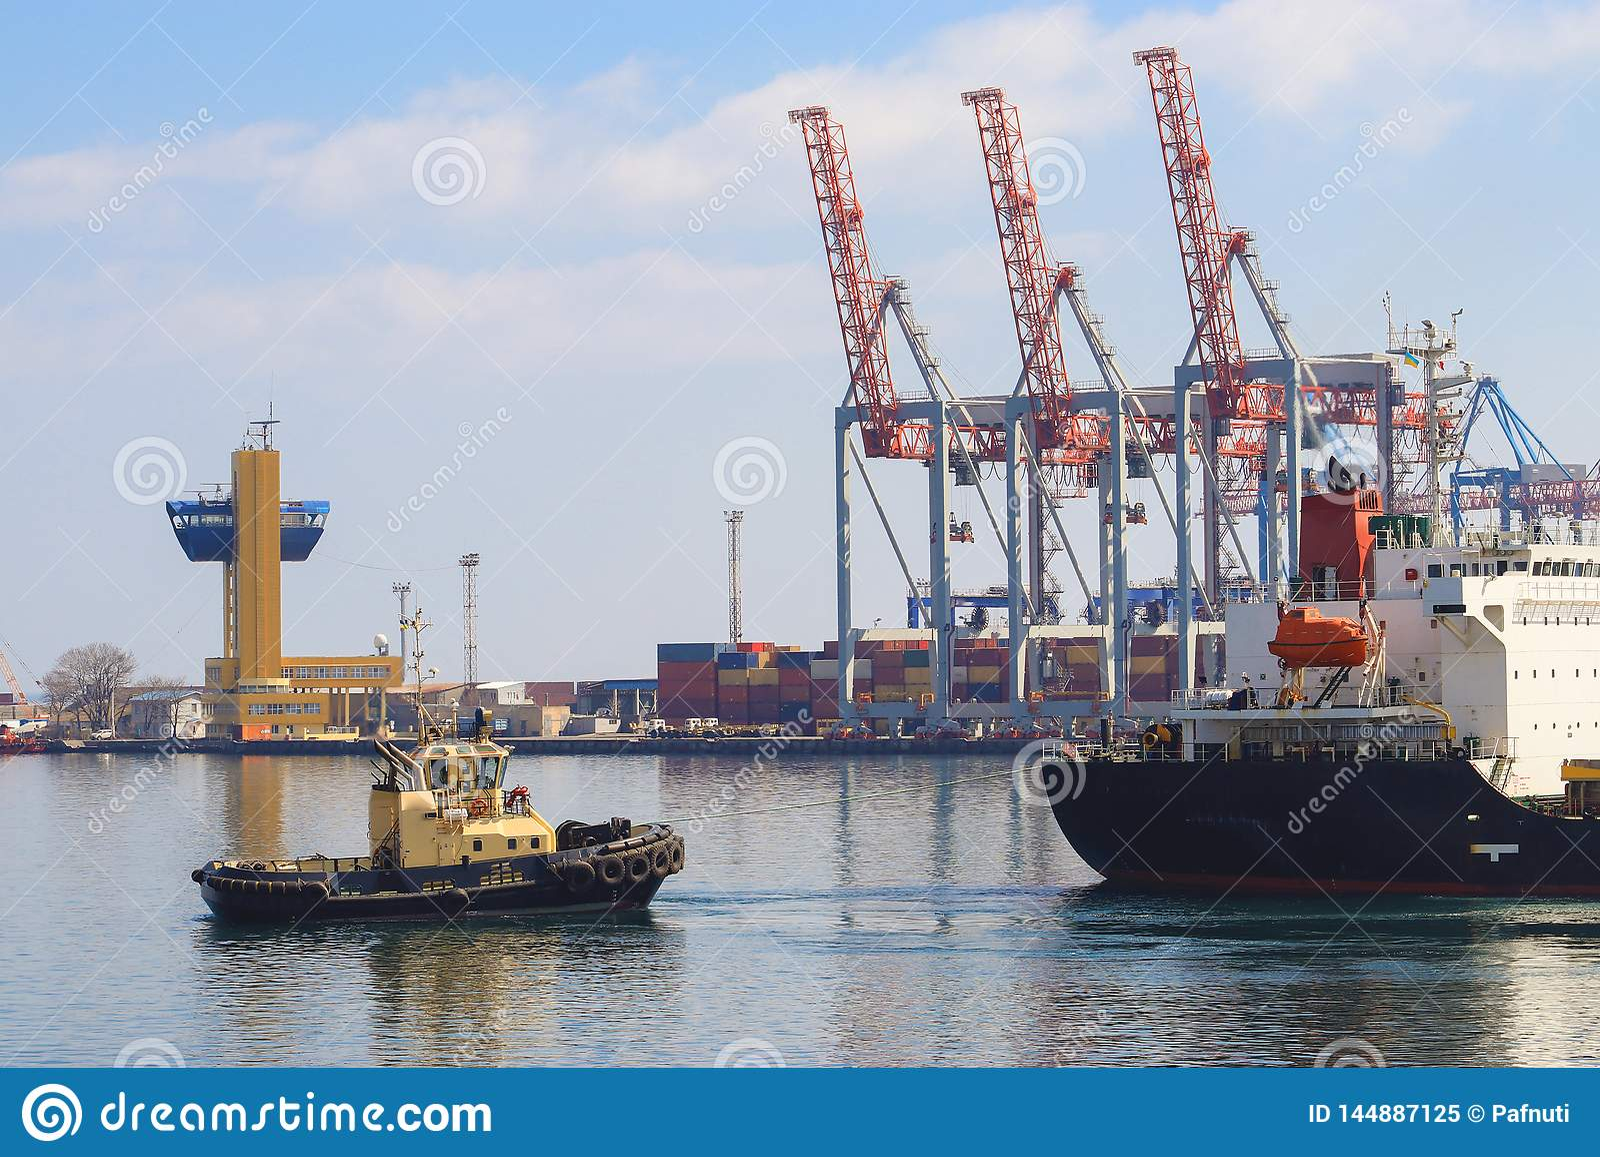 Tugboat assisting Cargo Ship maneuvered into the Port of Odessa, Ukraine.